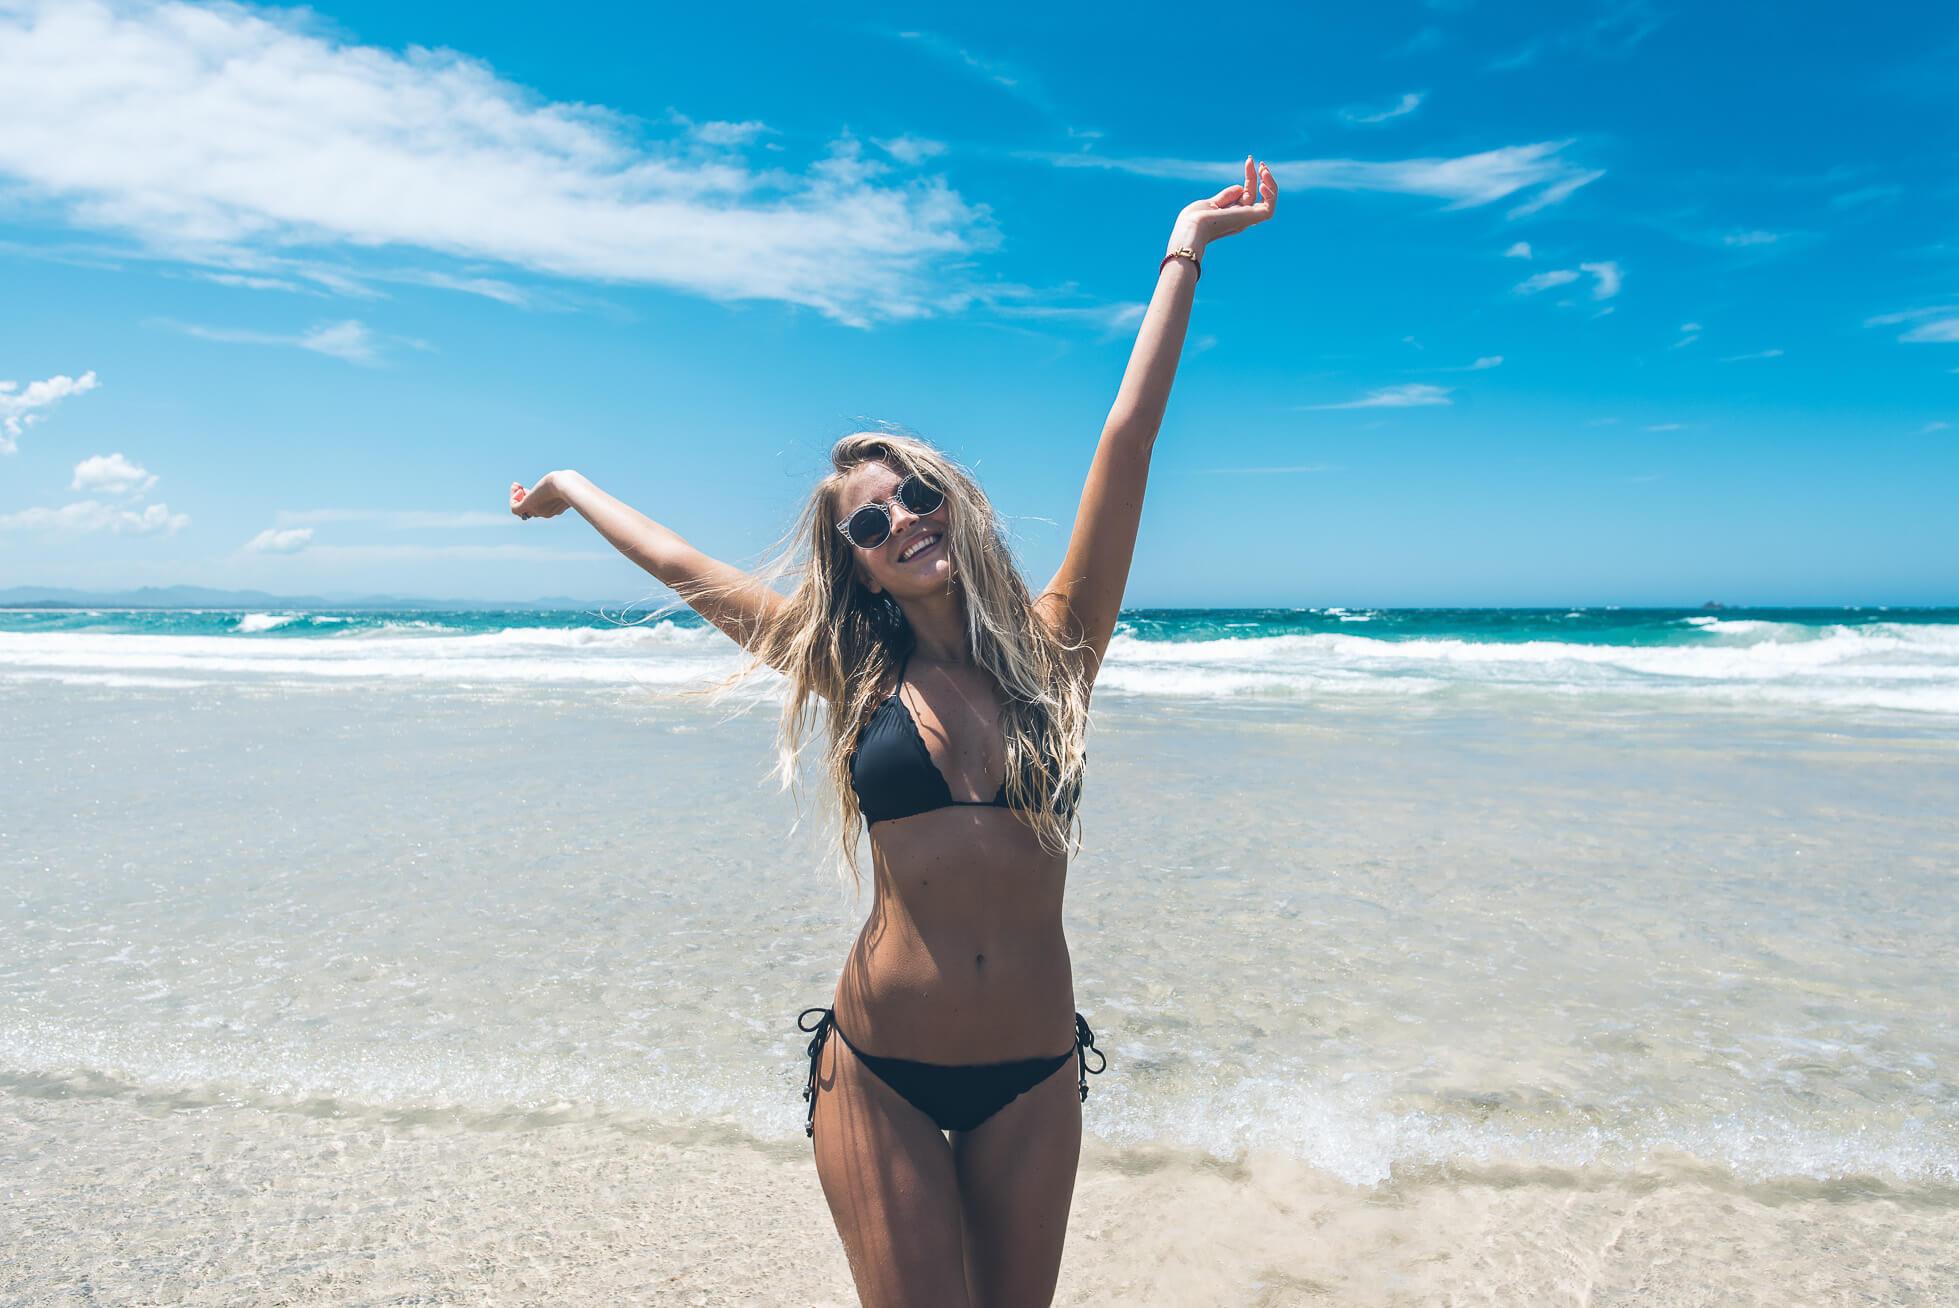 janni-deler-main-beach-byronDSC_3241-Redigera